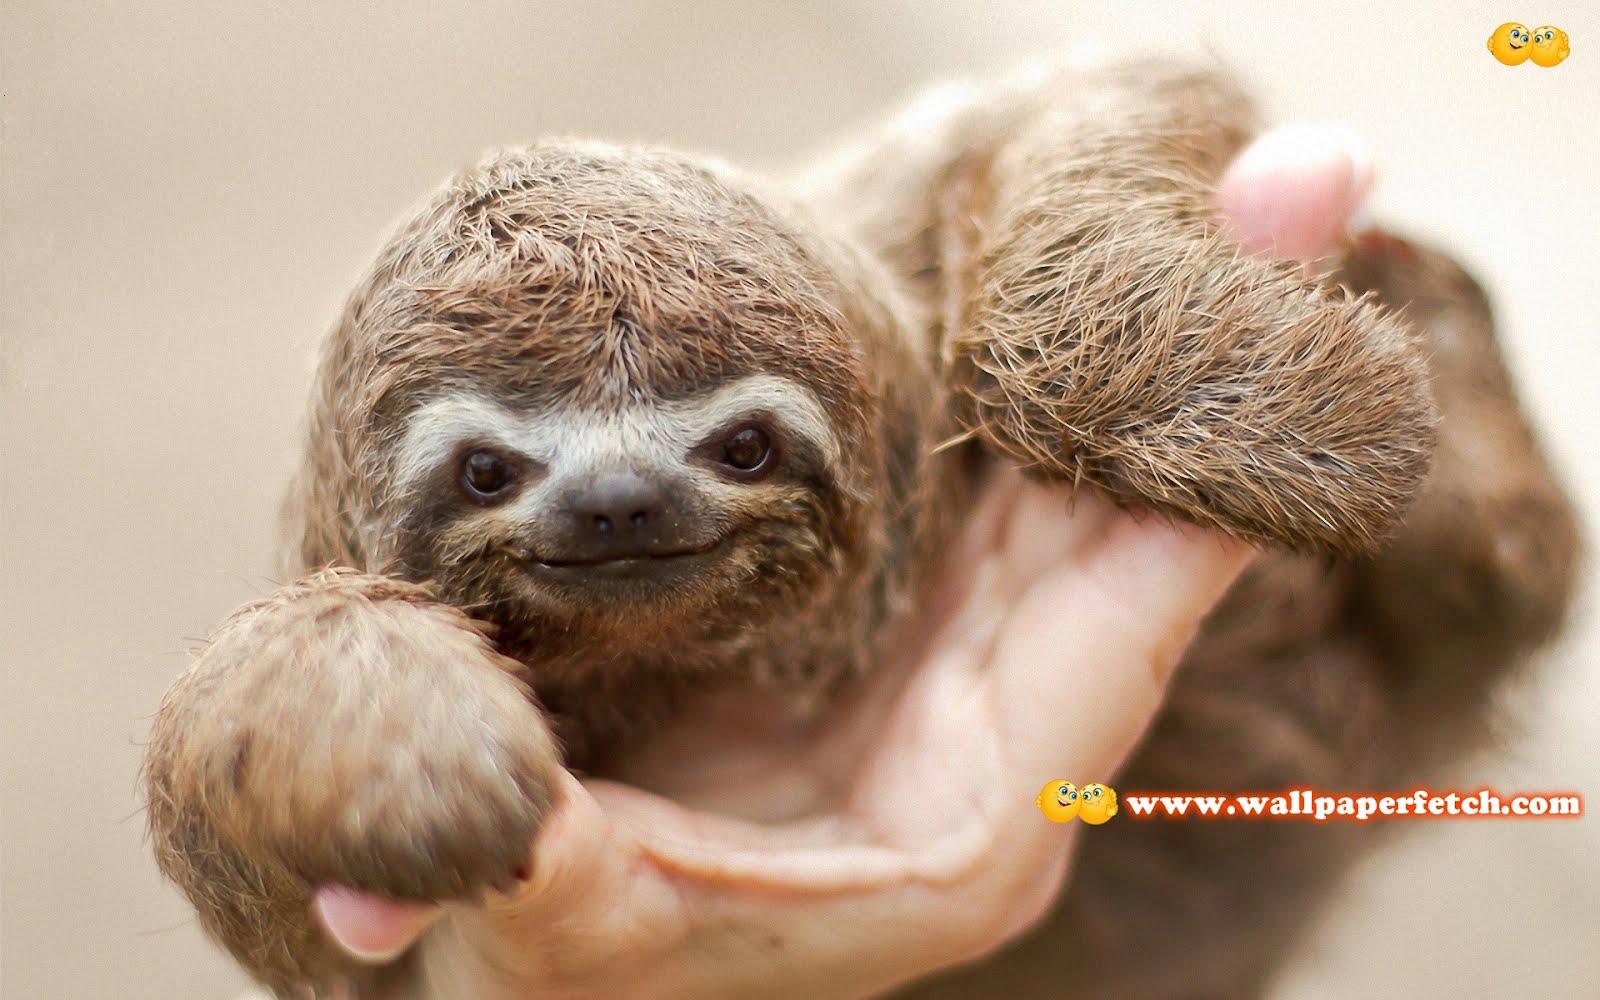 http://4.bp.blogspot.com/-nsAdbChWvvc/T1SS86ISsdI/AAAAAAAANVE/injmlB8m6Zw/s1600/sloth-baby-11213-1920x1200.jpg